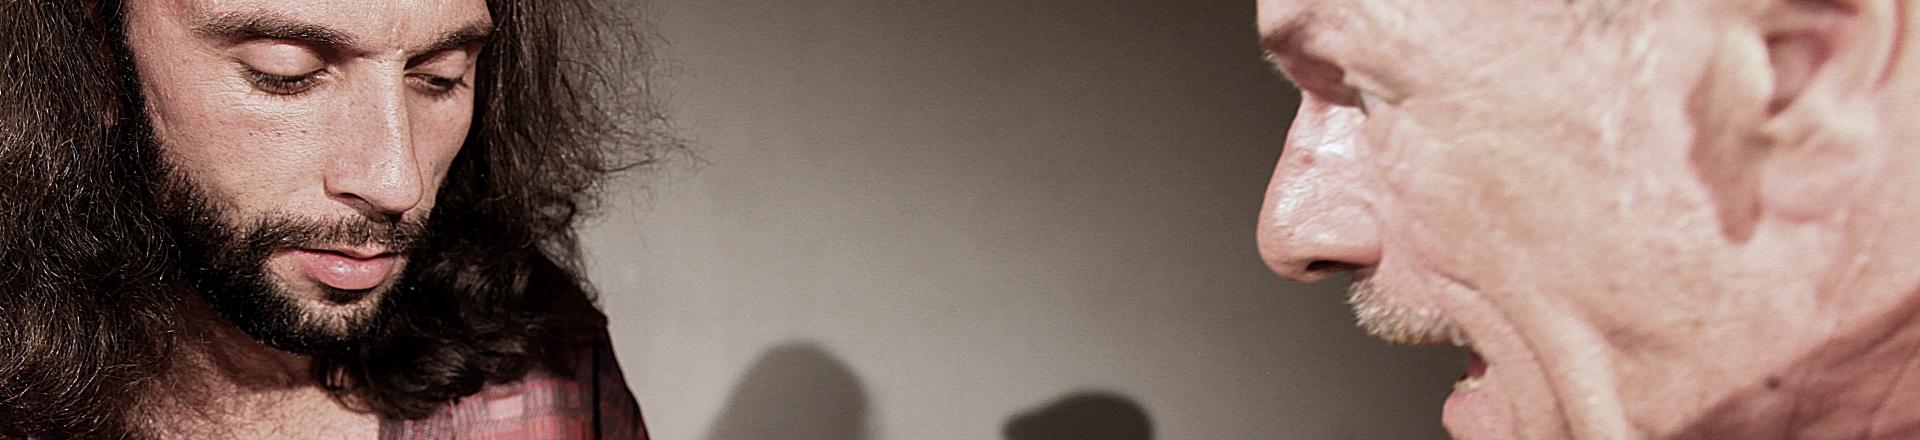 Paul Claudel | Der Tausch